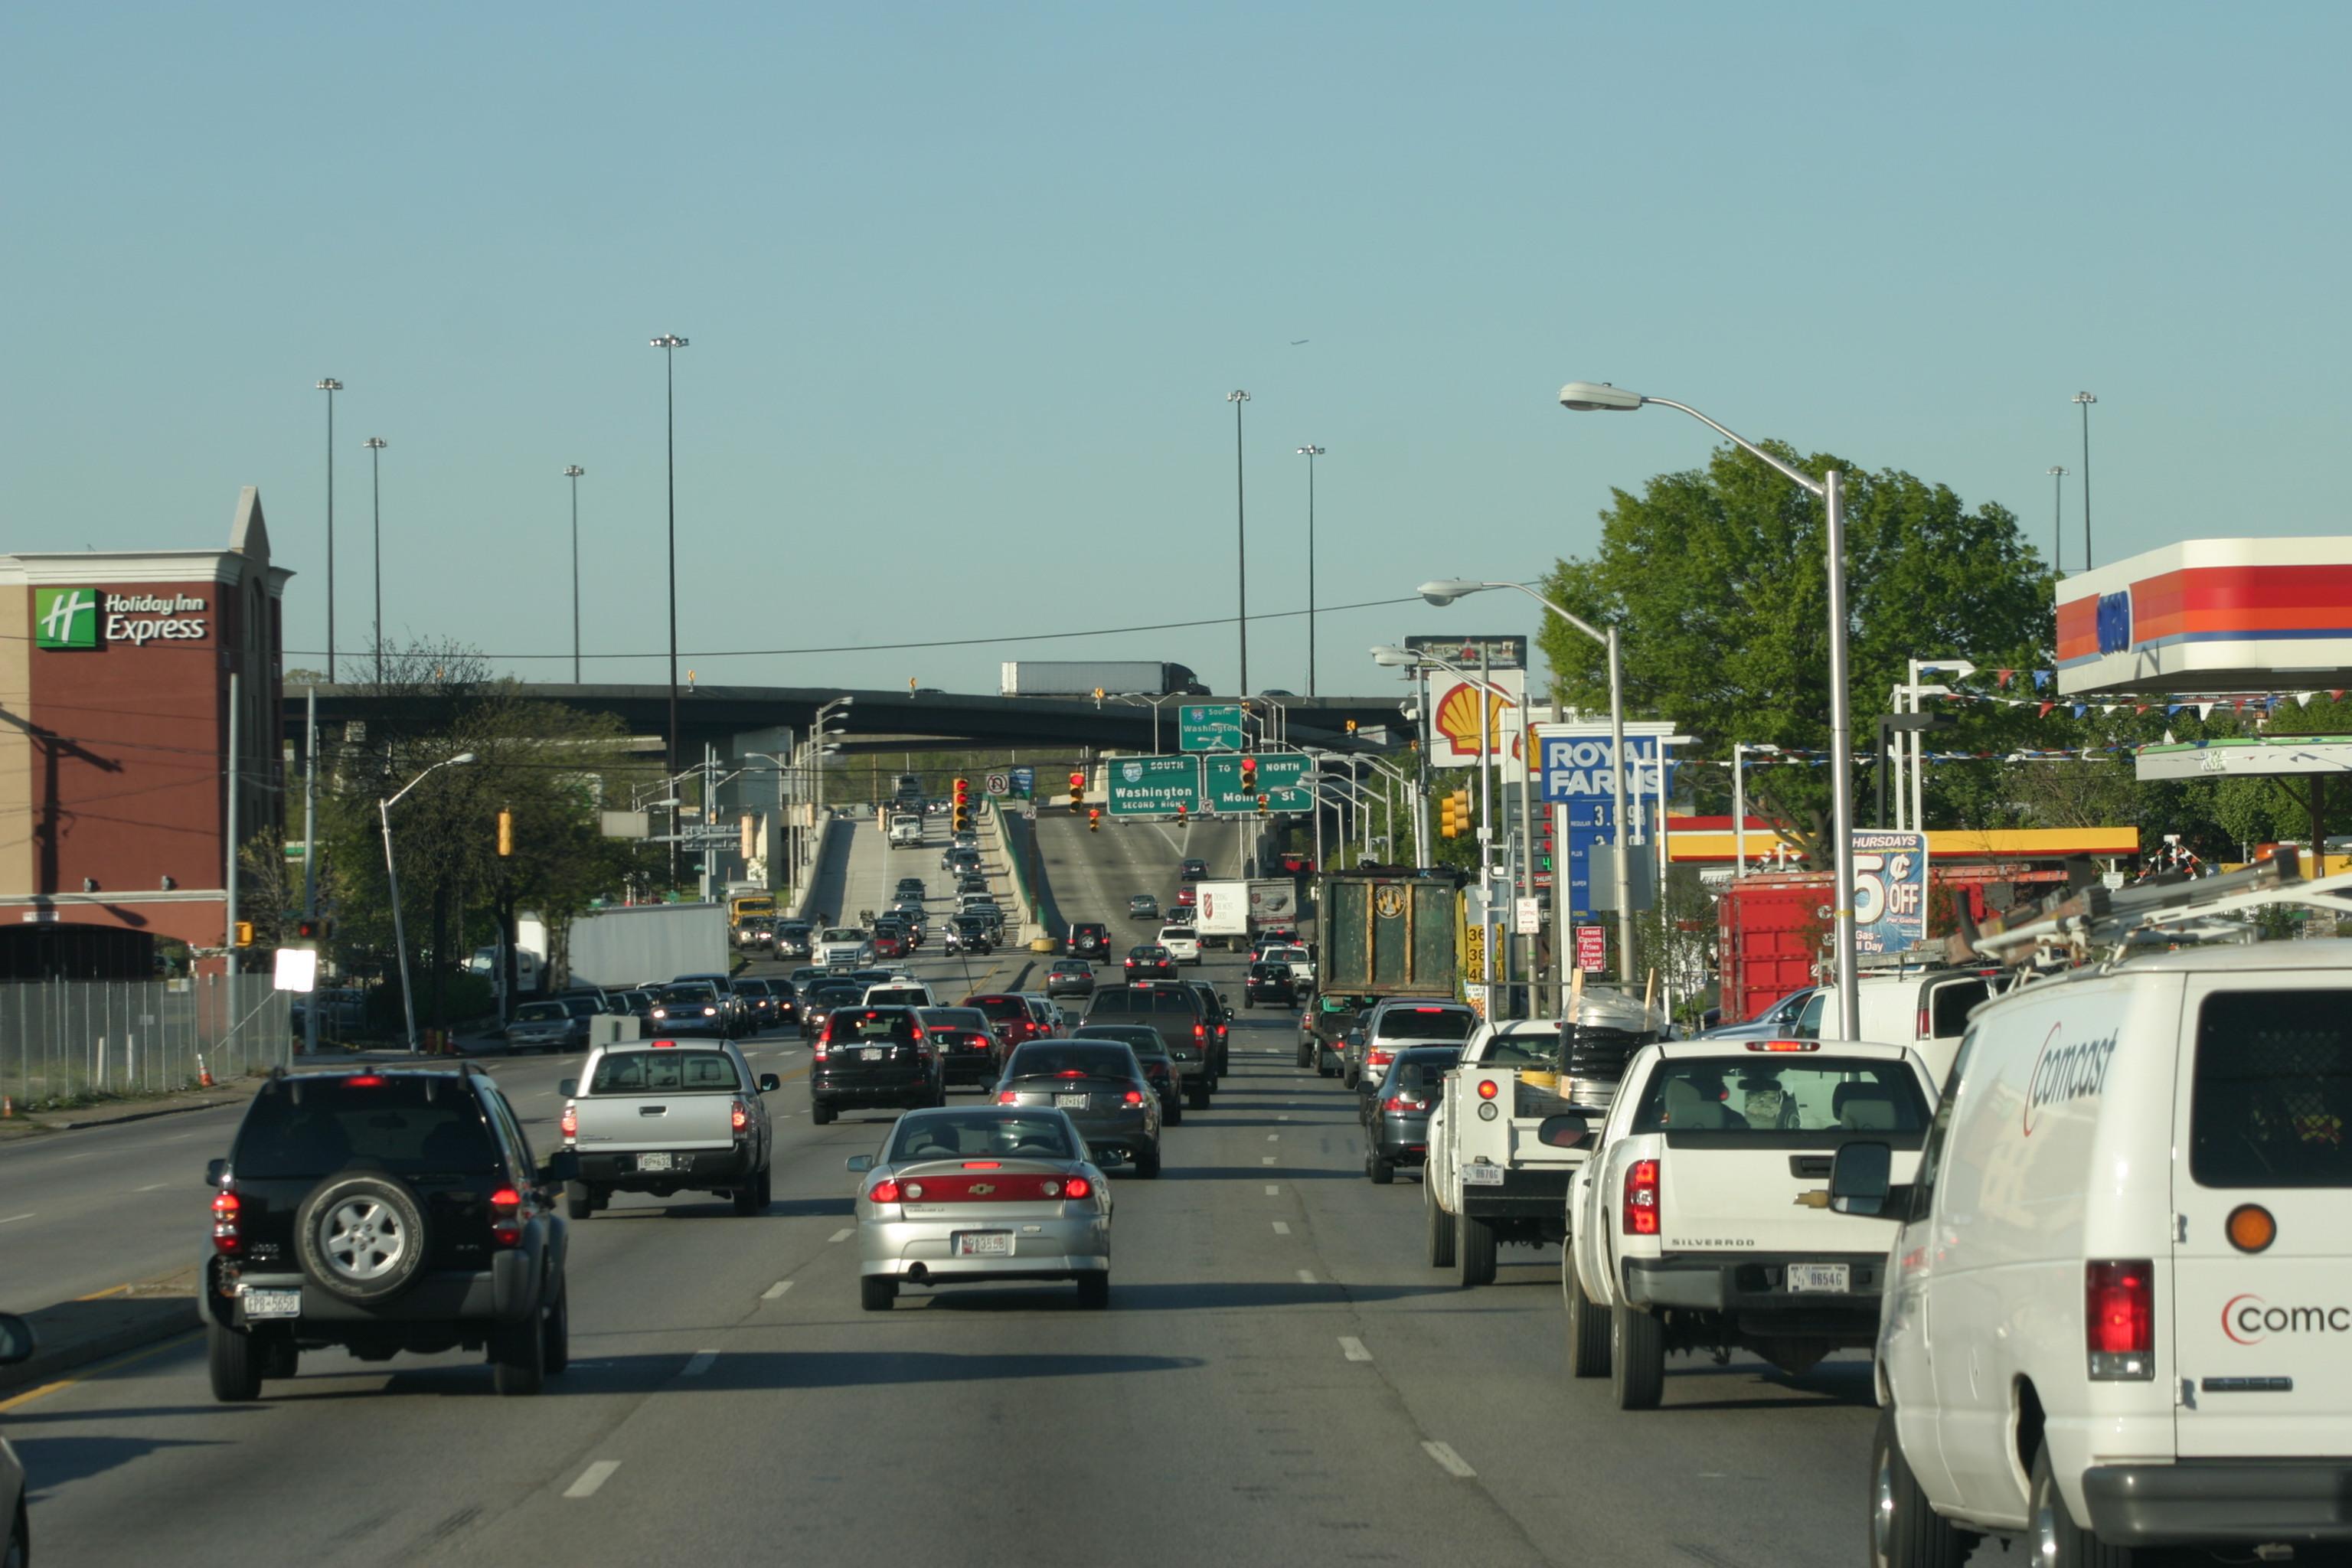 Street Traffic Street-traffic-in-balt.jpg